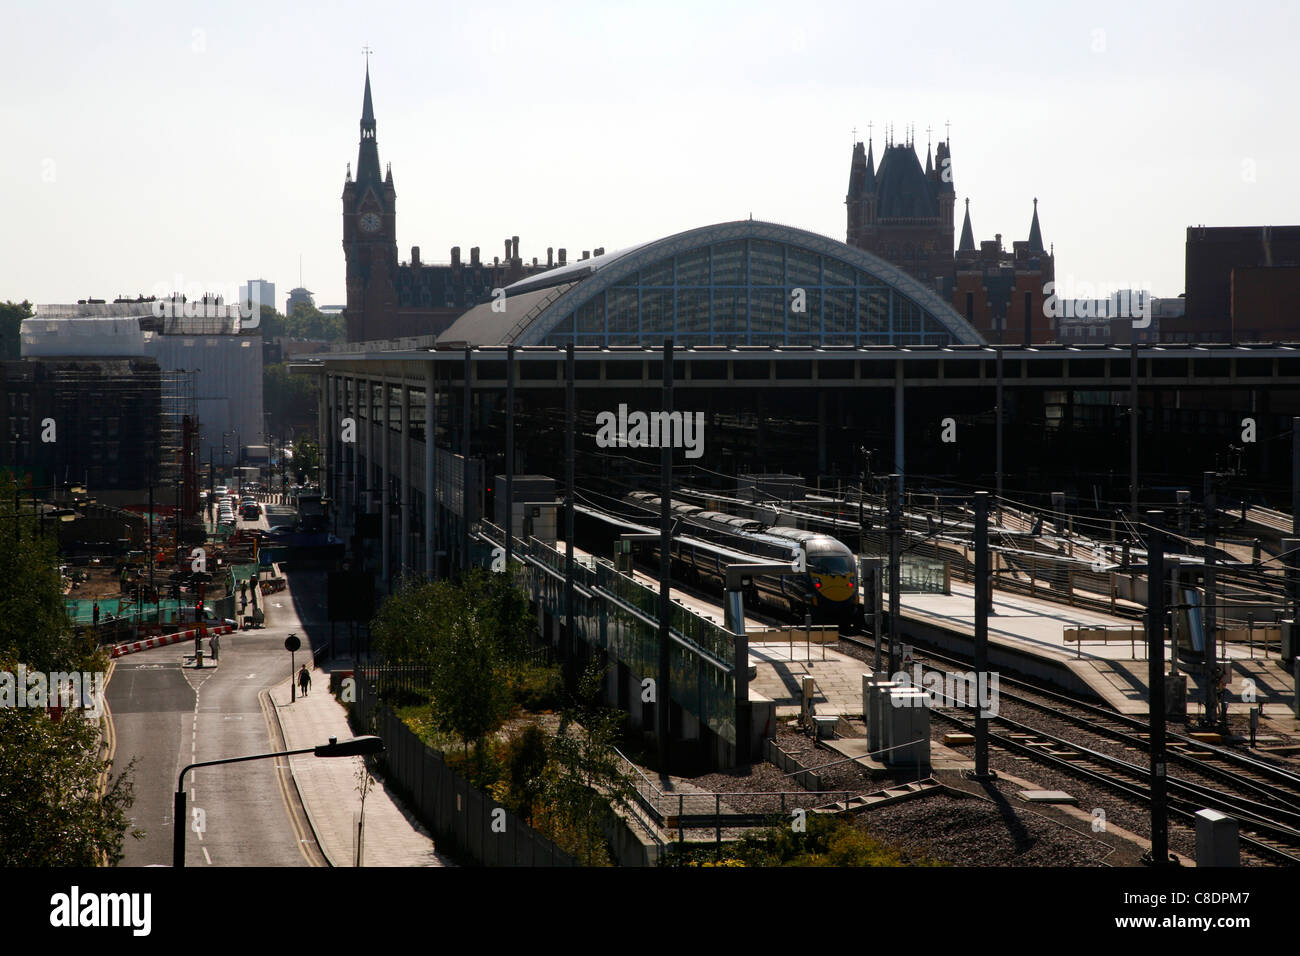 South Eastern train arriving at St Pancras Station, St Pancras, London, UK - Stock Image